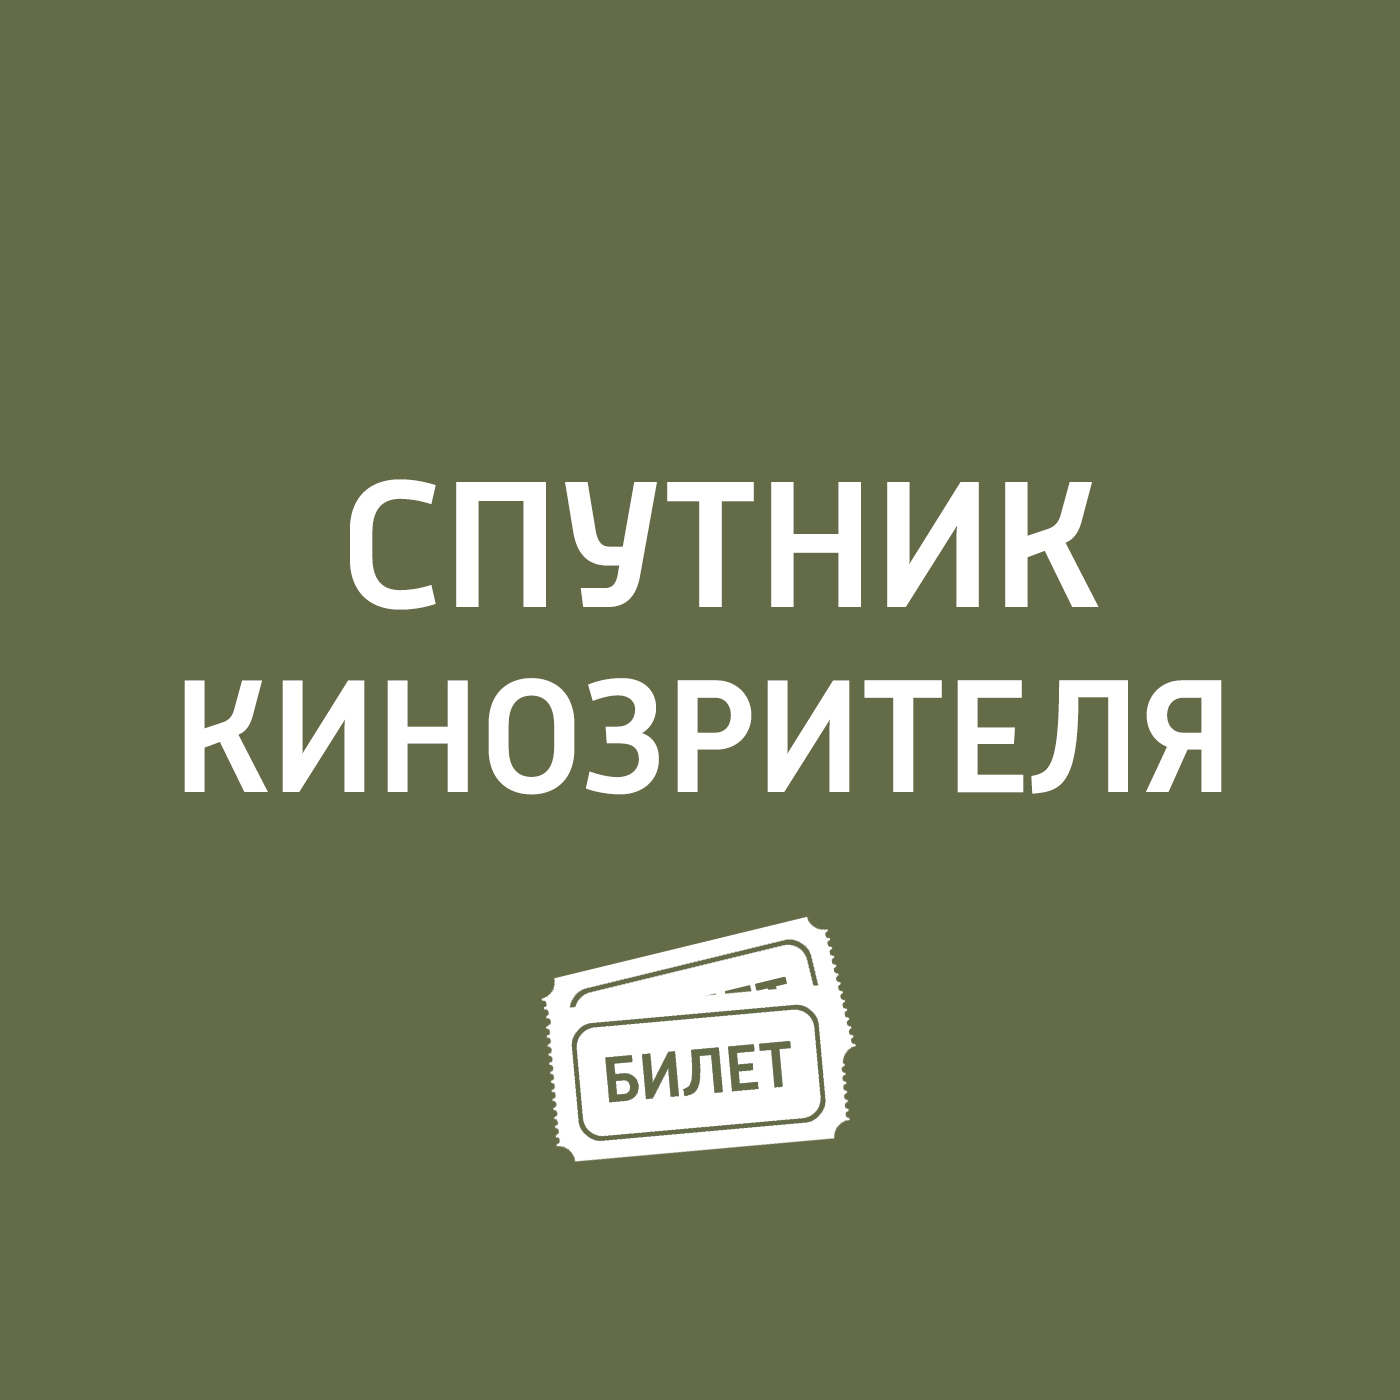 Антон Долин Номинанты Каннского кинофестиваля-2017